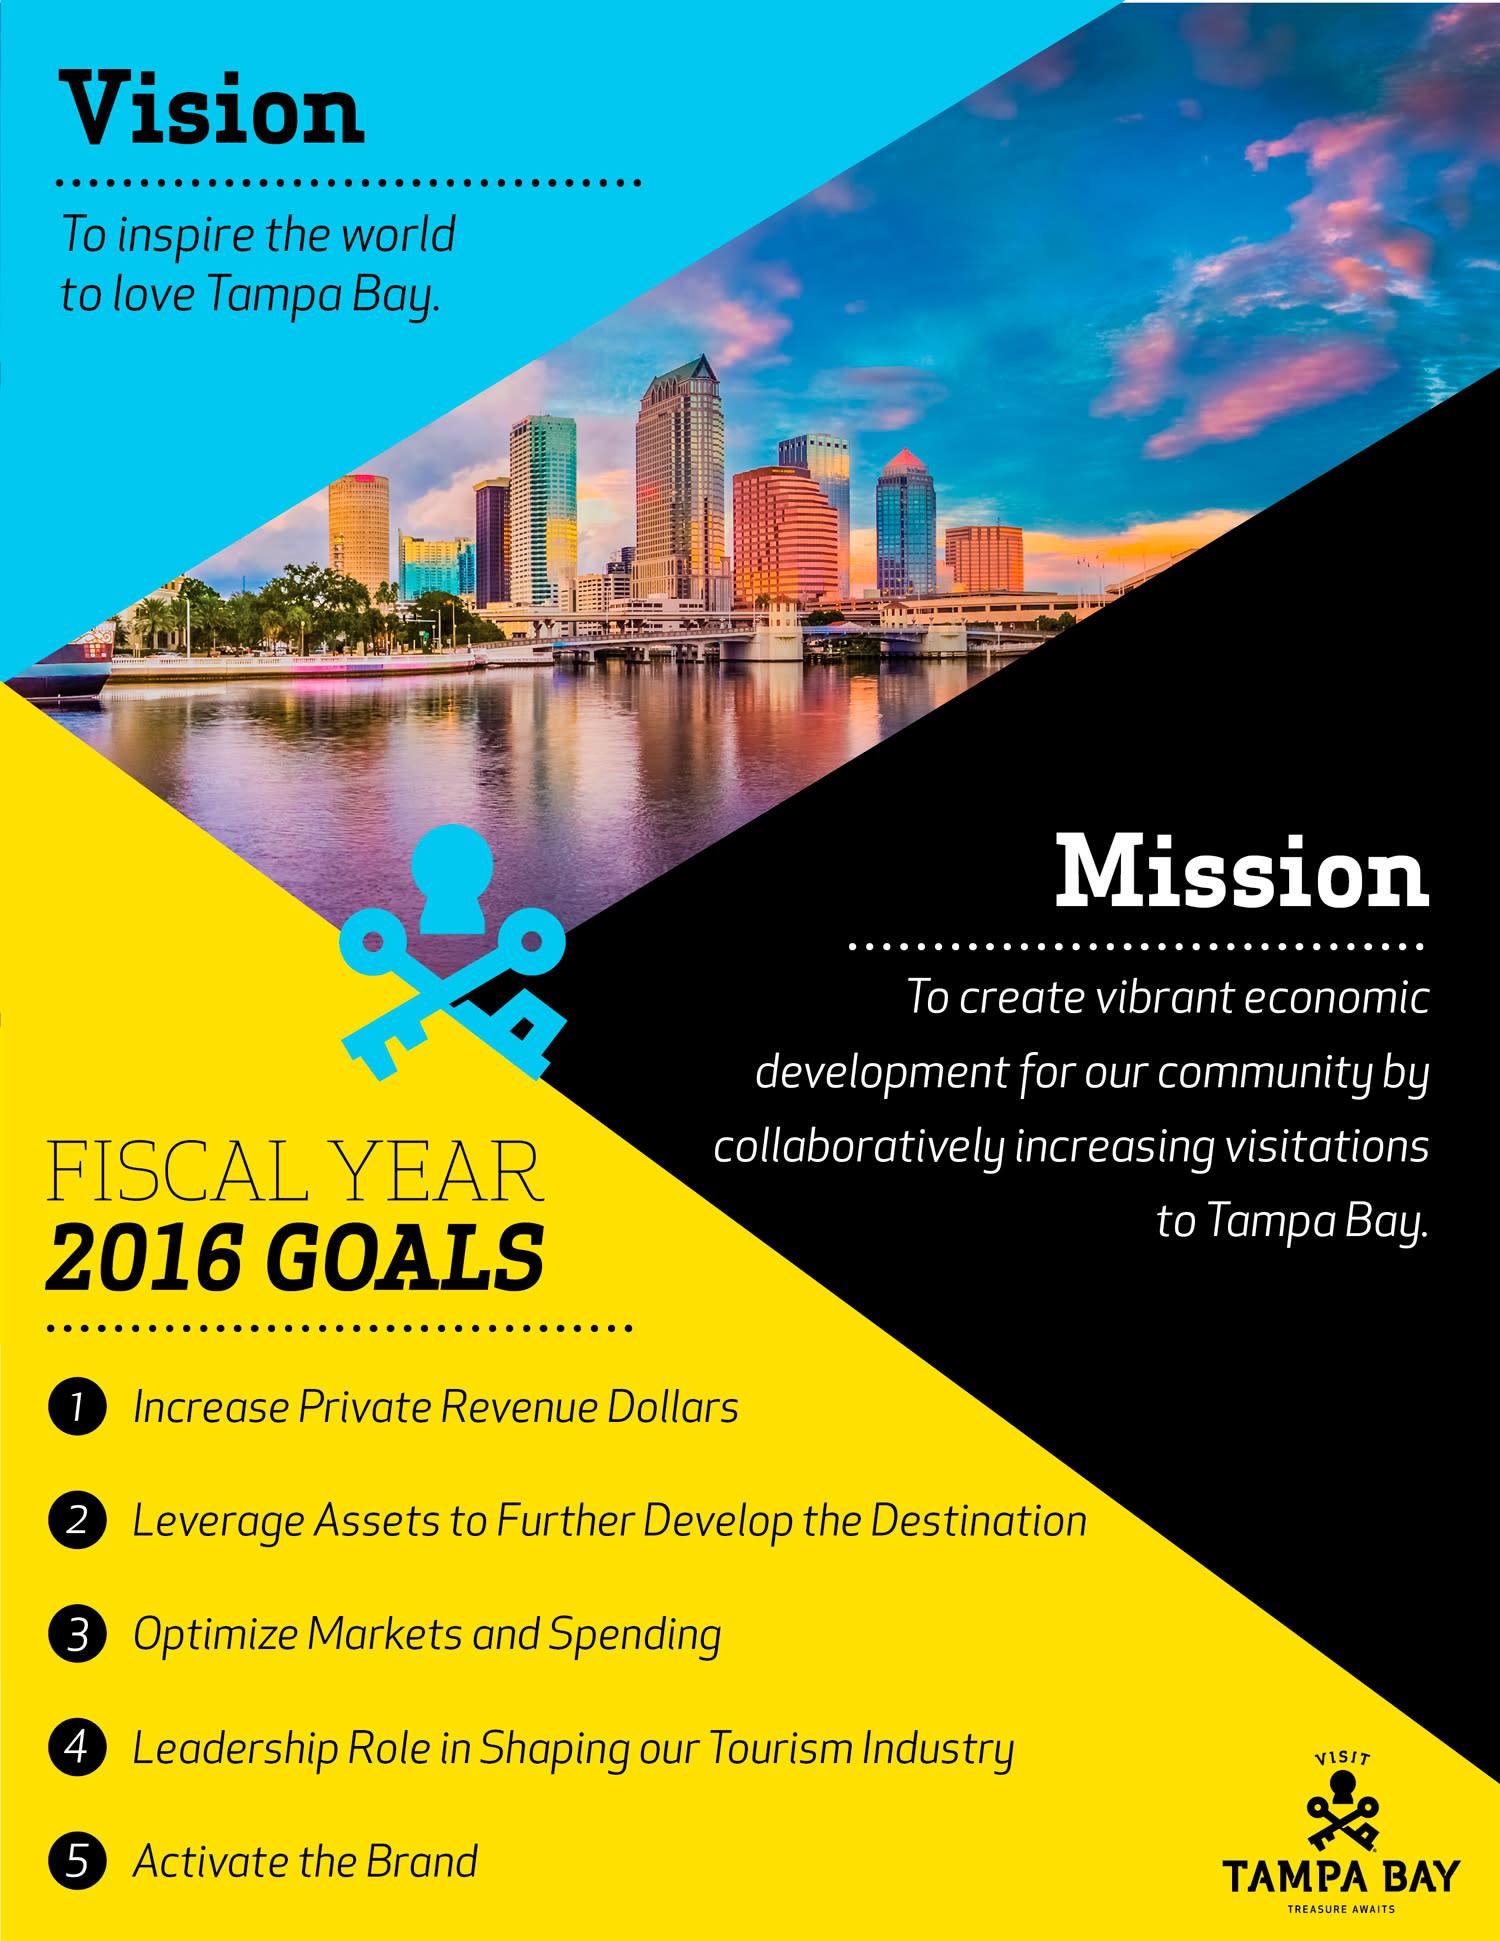 2016 Fiscal Goals